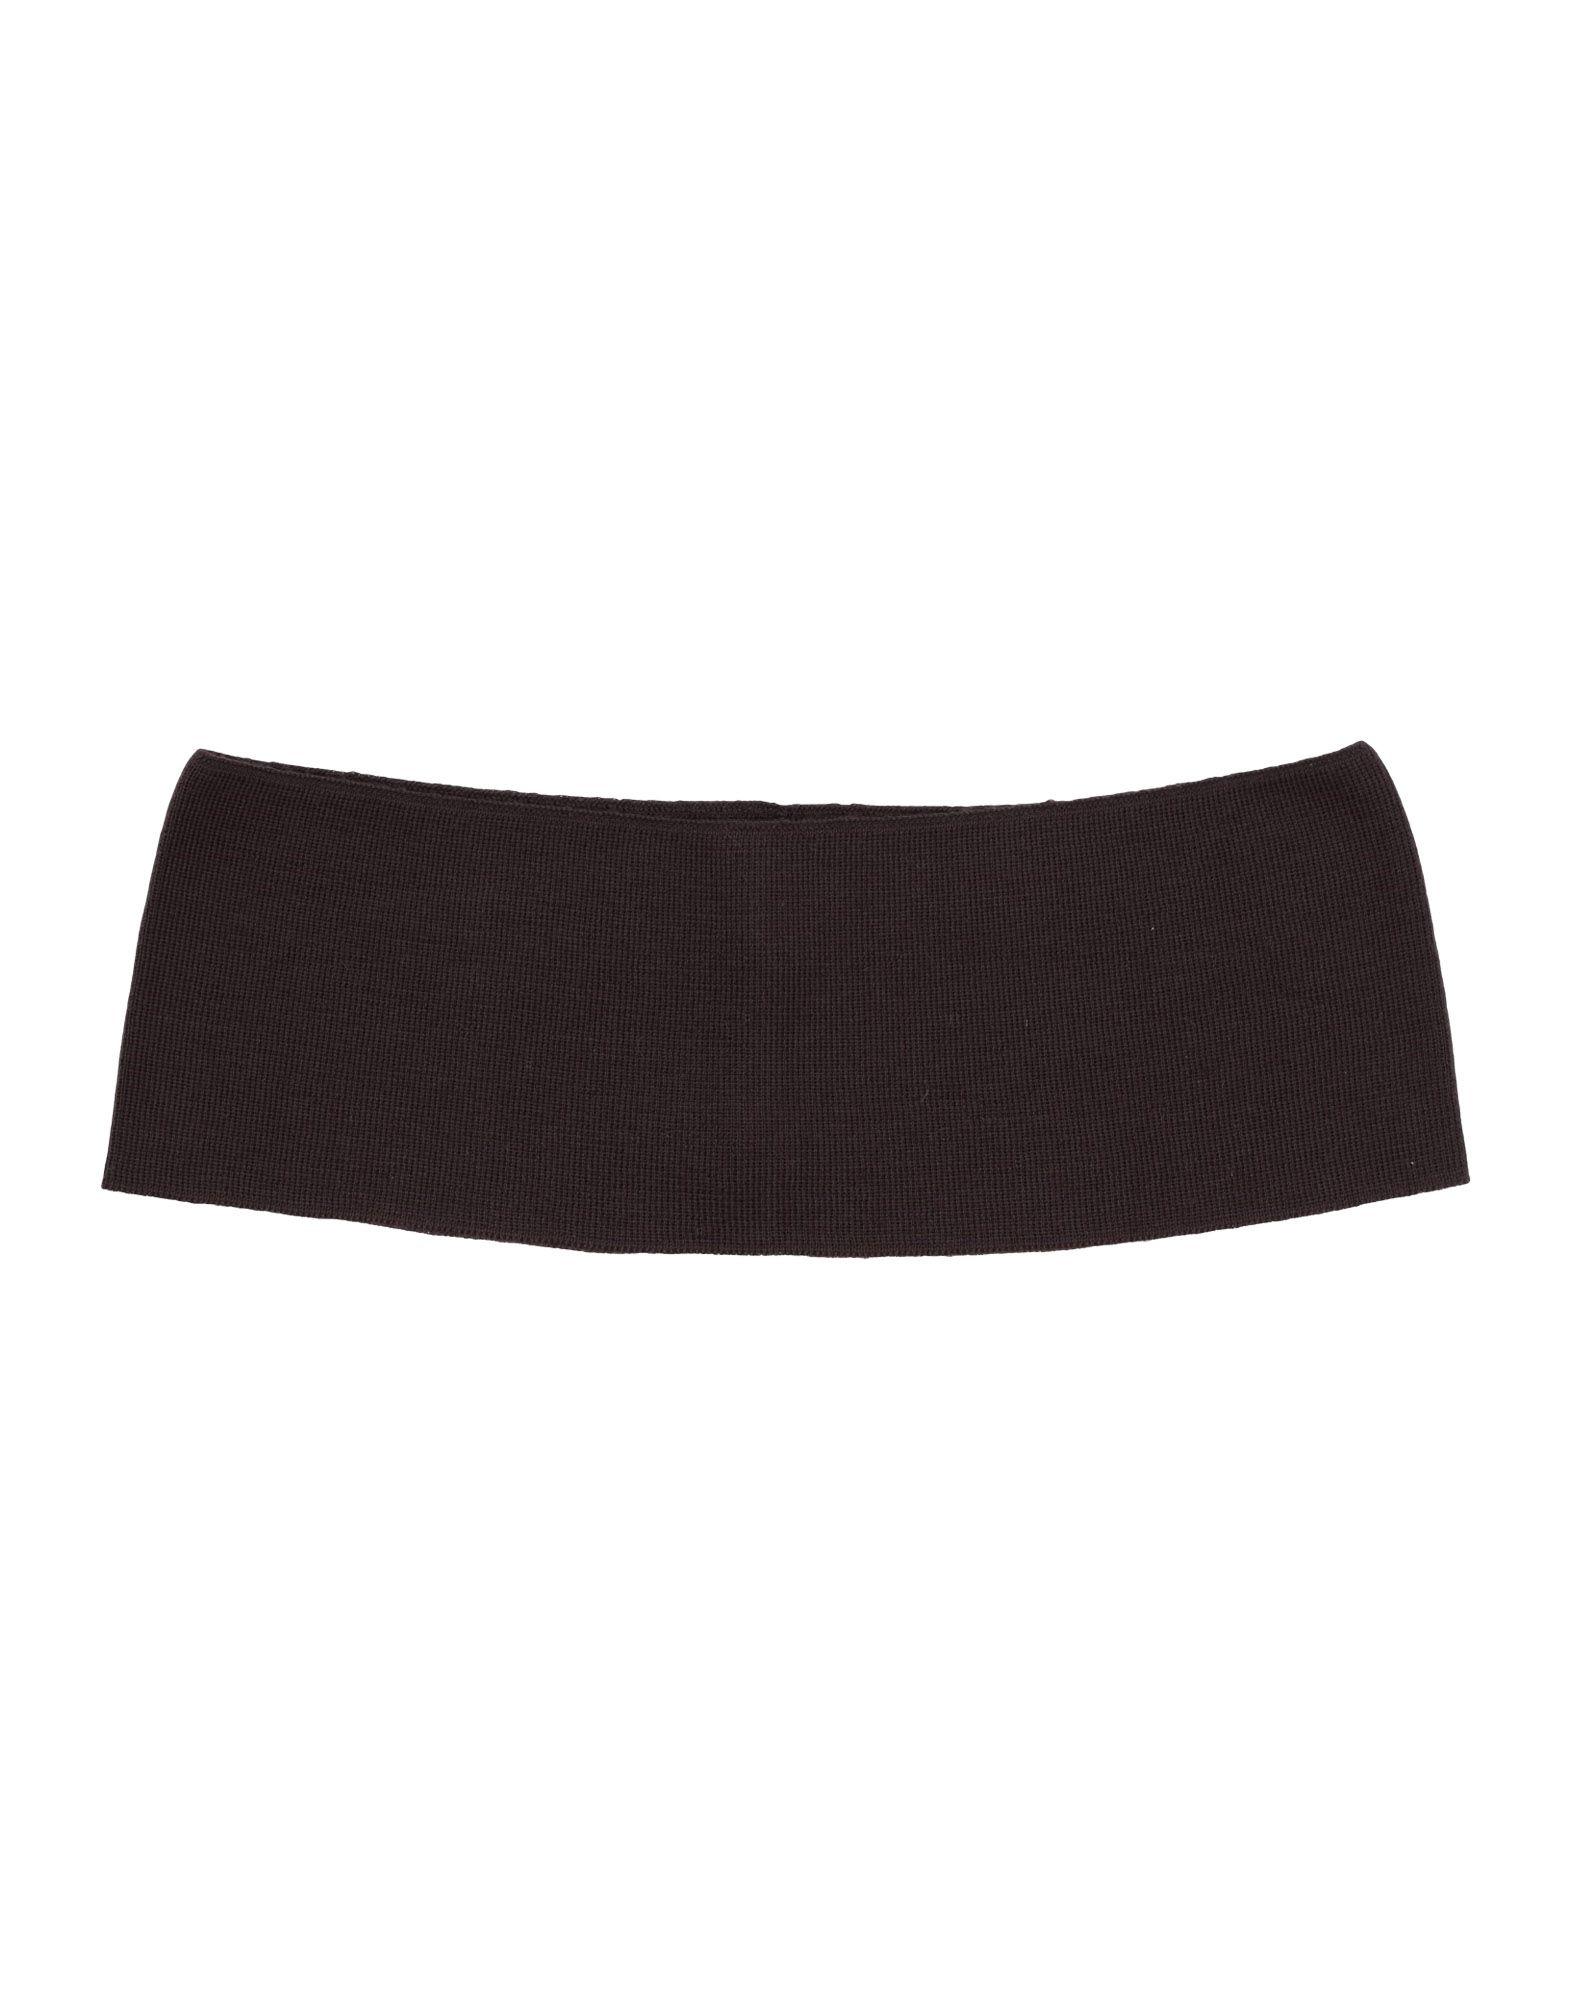 b4181249e0 Брендовая женская одежда и аксессуары - сток Itsunsolutions